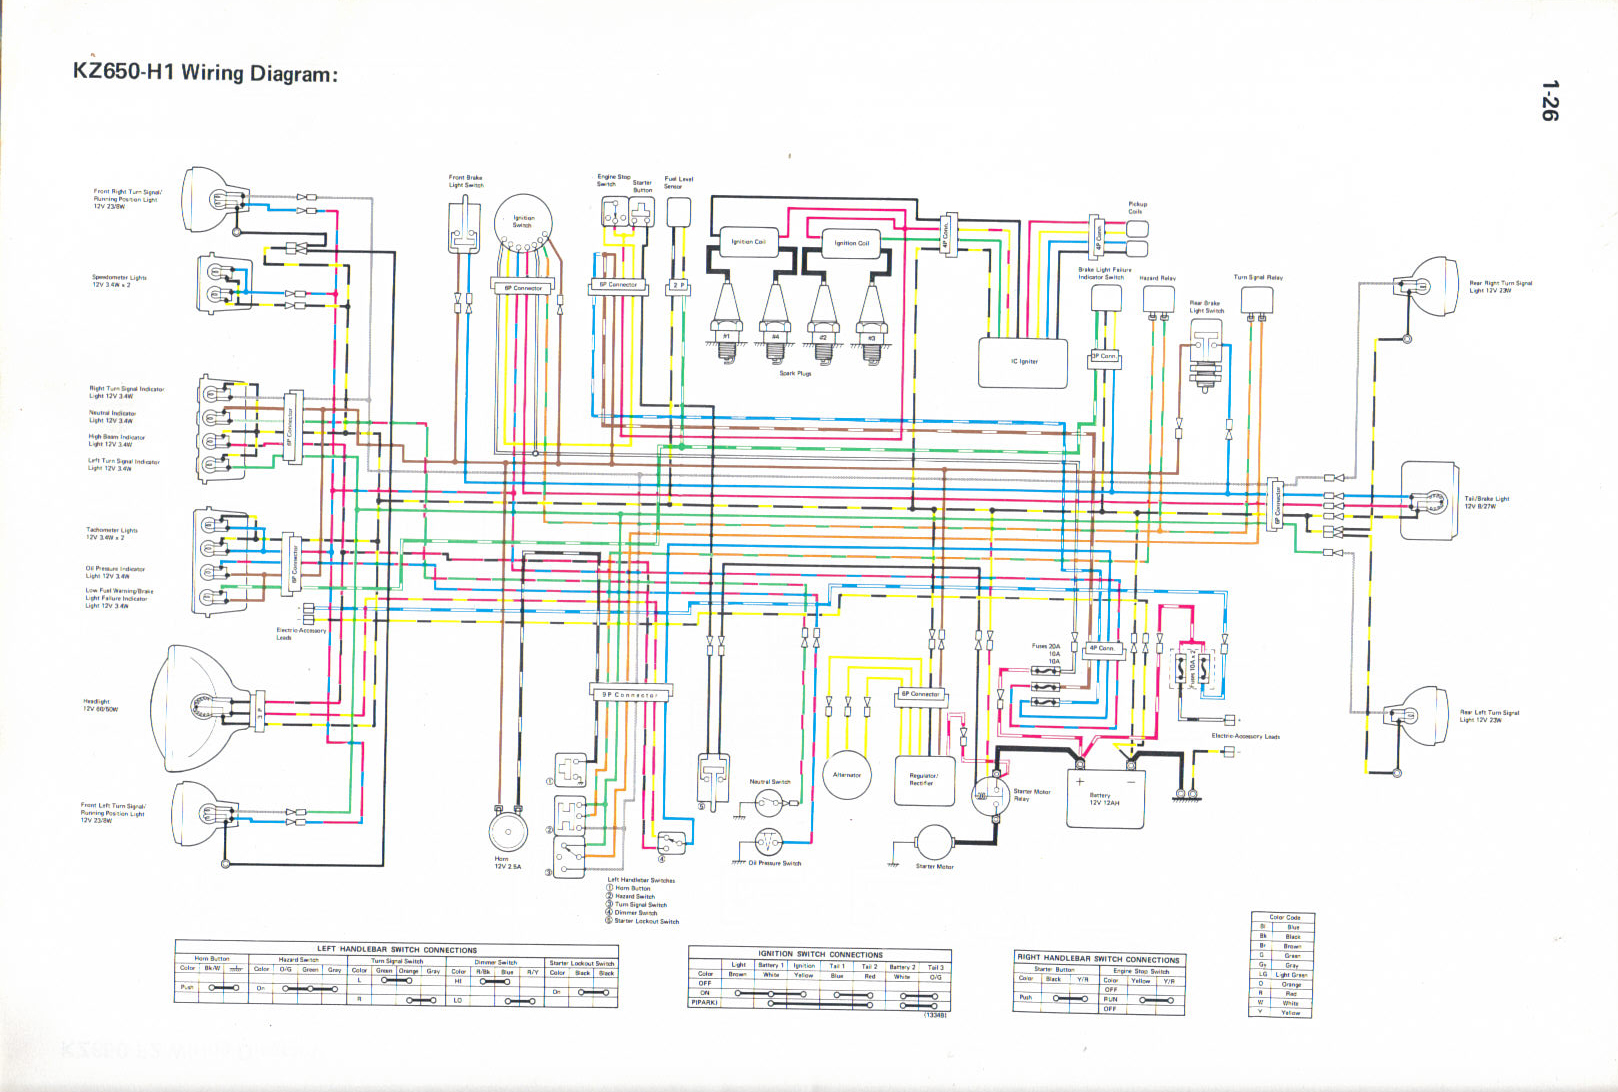 H1 Wiring Diagrams - My Wiring Diagram on pontiac alternator wiring diagram, mercury alternator wiring diagram, plymouth alternator wiring diagram, oldsmobile alternator wiring diagram, lincoln alternator wiring diagram, corvette alternator wiring diagram, suzuki alternator wiring diagram, gmc alternator wiring diagram, rolls royce alternator wiring diagram, mini alternator wiring diagram, freightliner alternator wiring diagram, volkswagen alternator wiring diagram, jeep alternator wiring diagram, gm alternator wiring diagram,